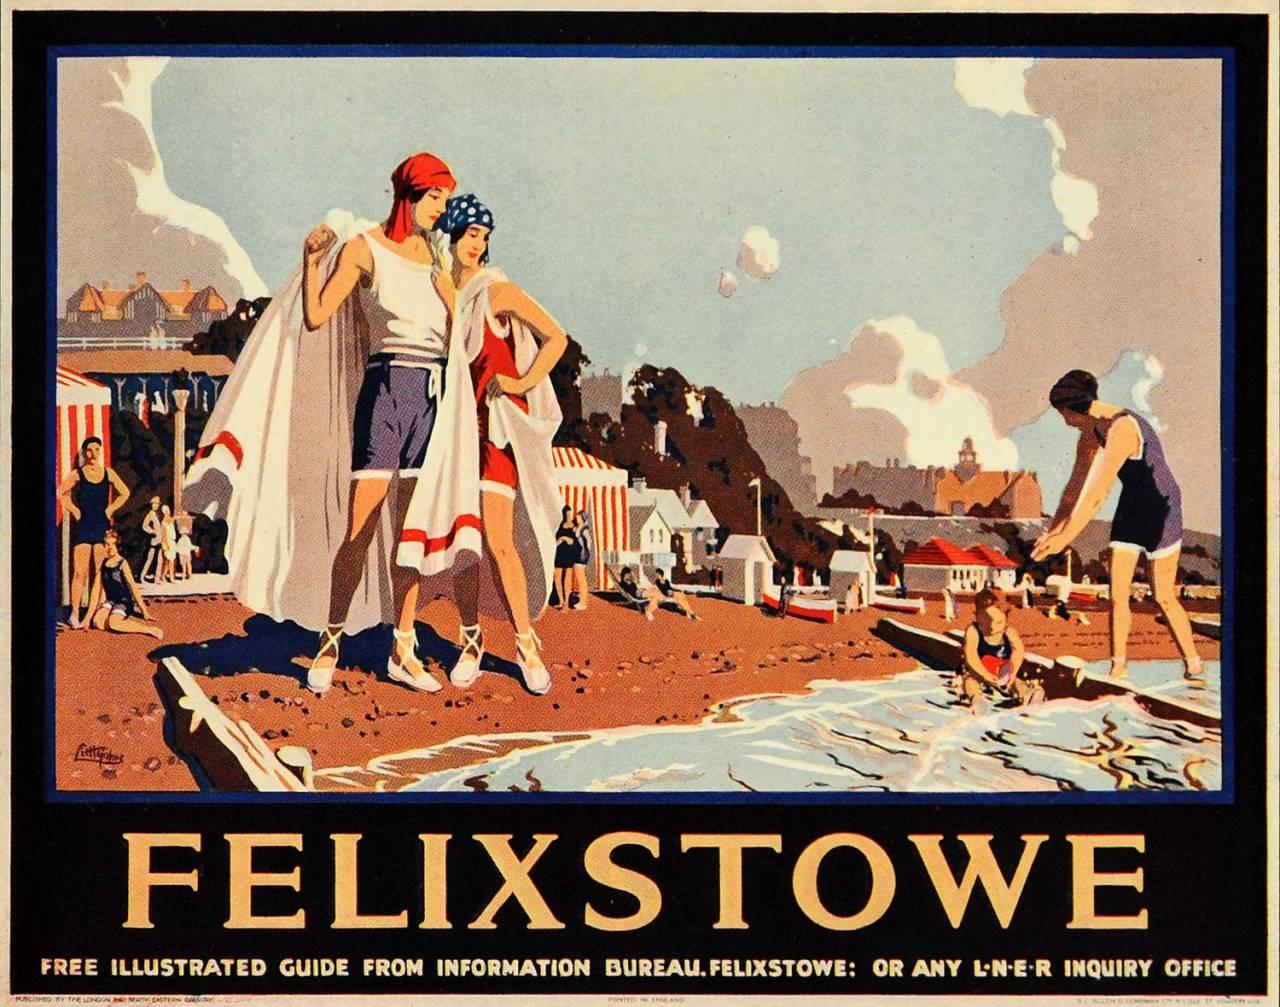 1933-felixstowe-beach-lner-j_-littlejohns-1280x1007.jpg